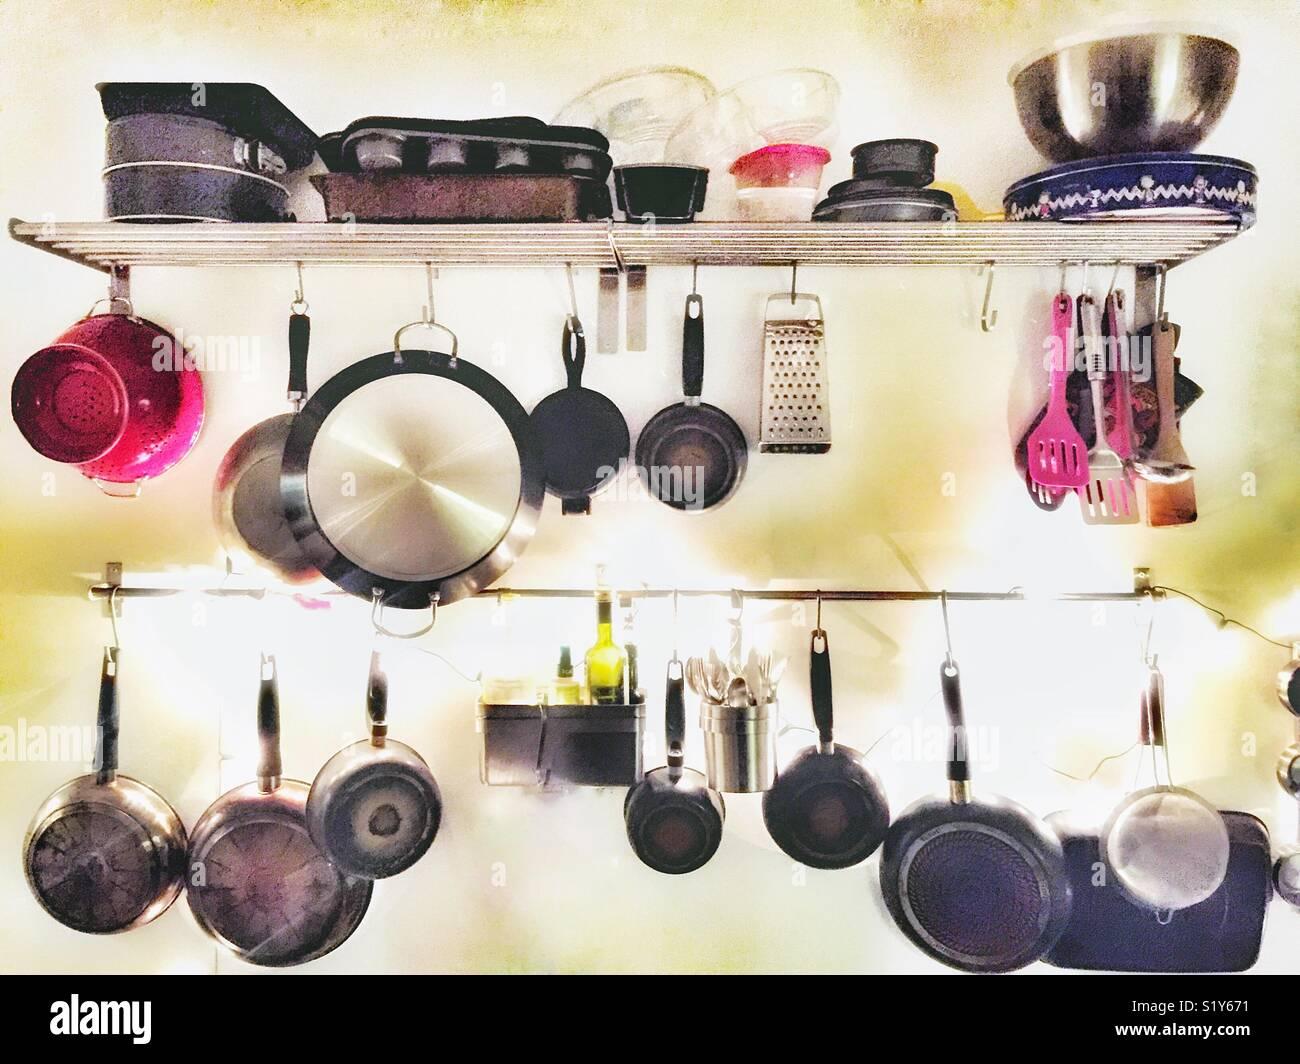 Utensili da cucina su una parete Foto & Immagine Stock: 310998885 ...